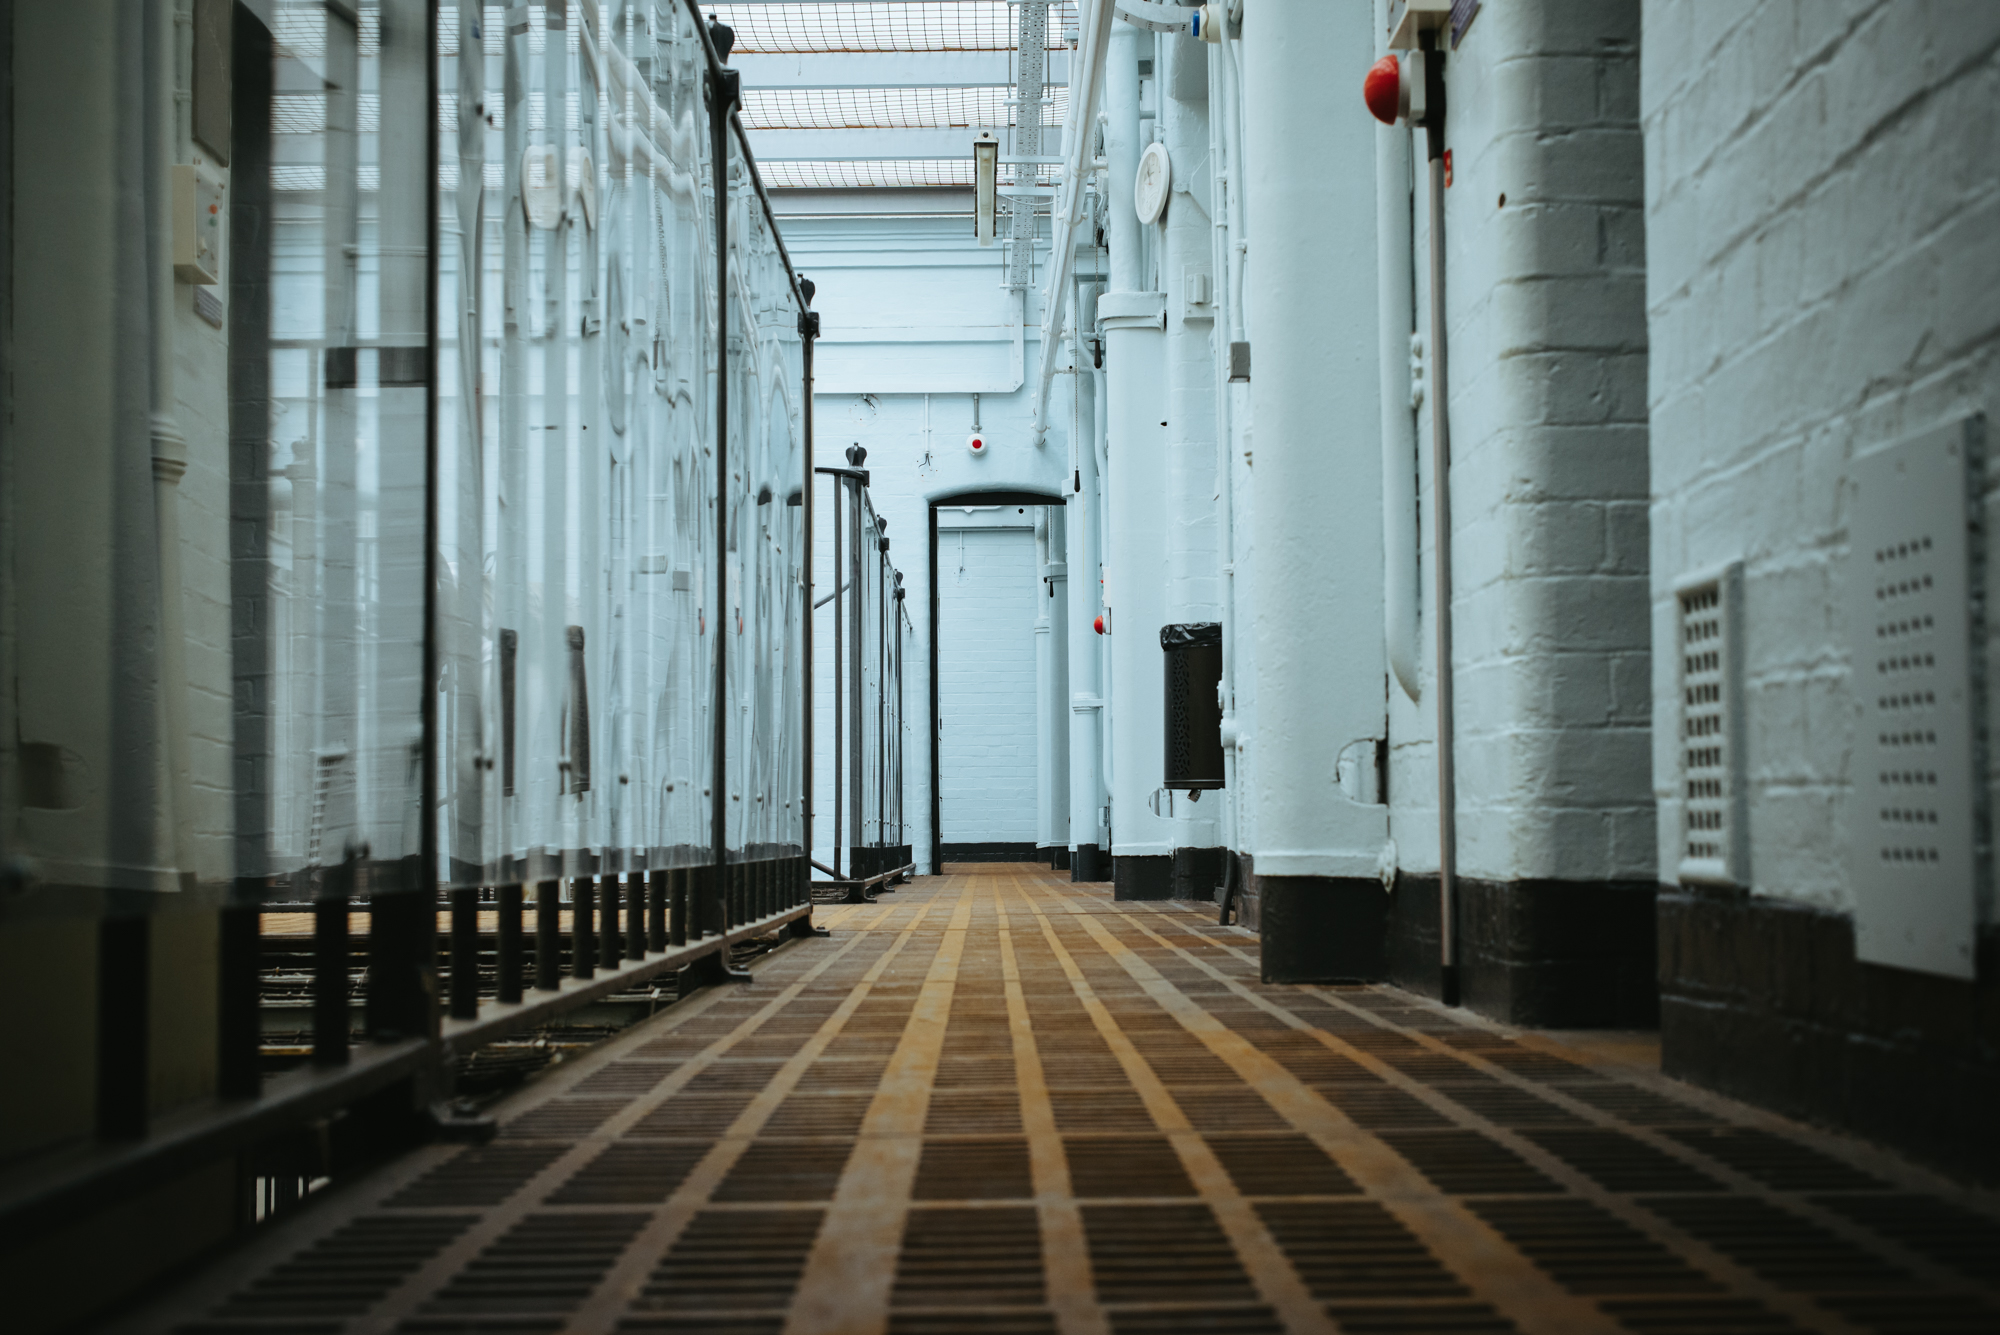 Steelhouse-Lane-Lock-Up-Birmingham-Hanny-Foxhall-_DSC1121.jpg